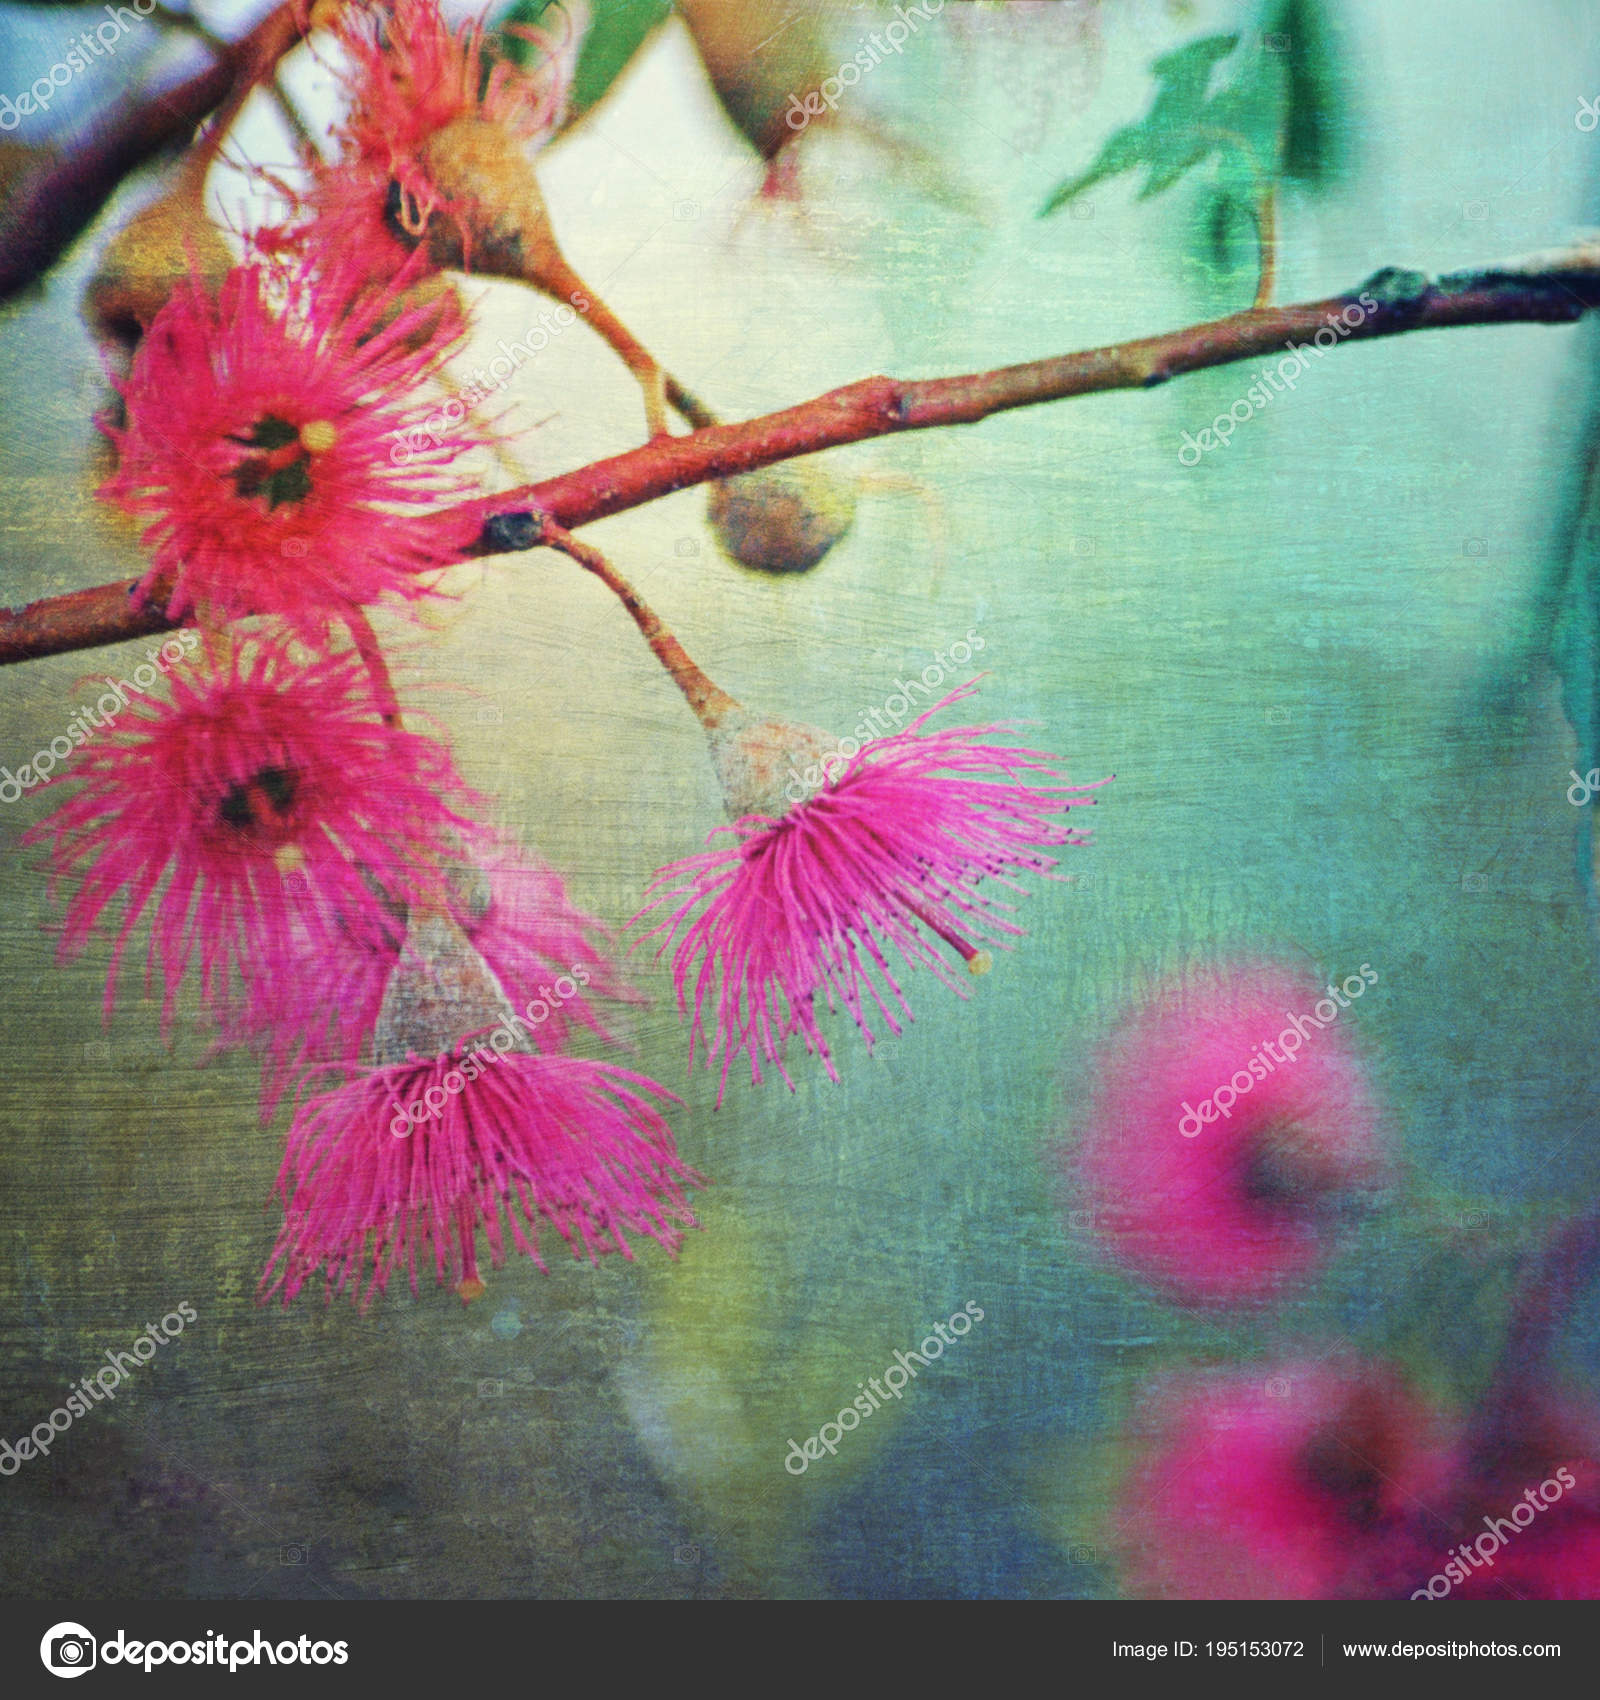 Grunge textured vintage style pink flowering gum blossoms perth grunge textured vintage style pink flowering gum blossoms perth western stock photo mightylinksfo